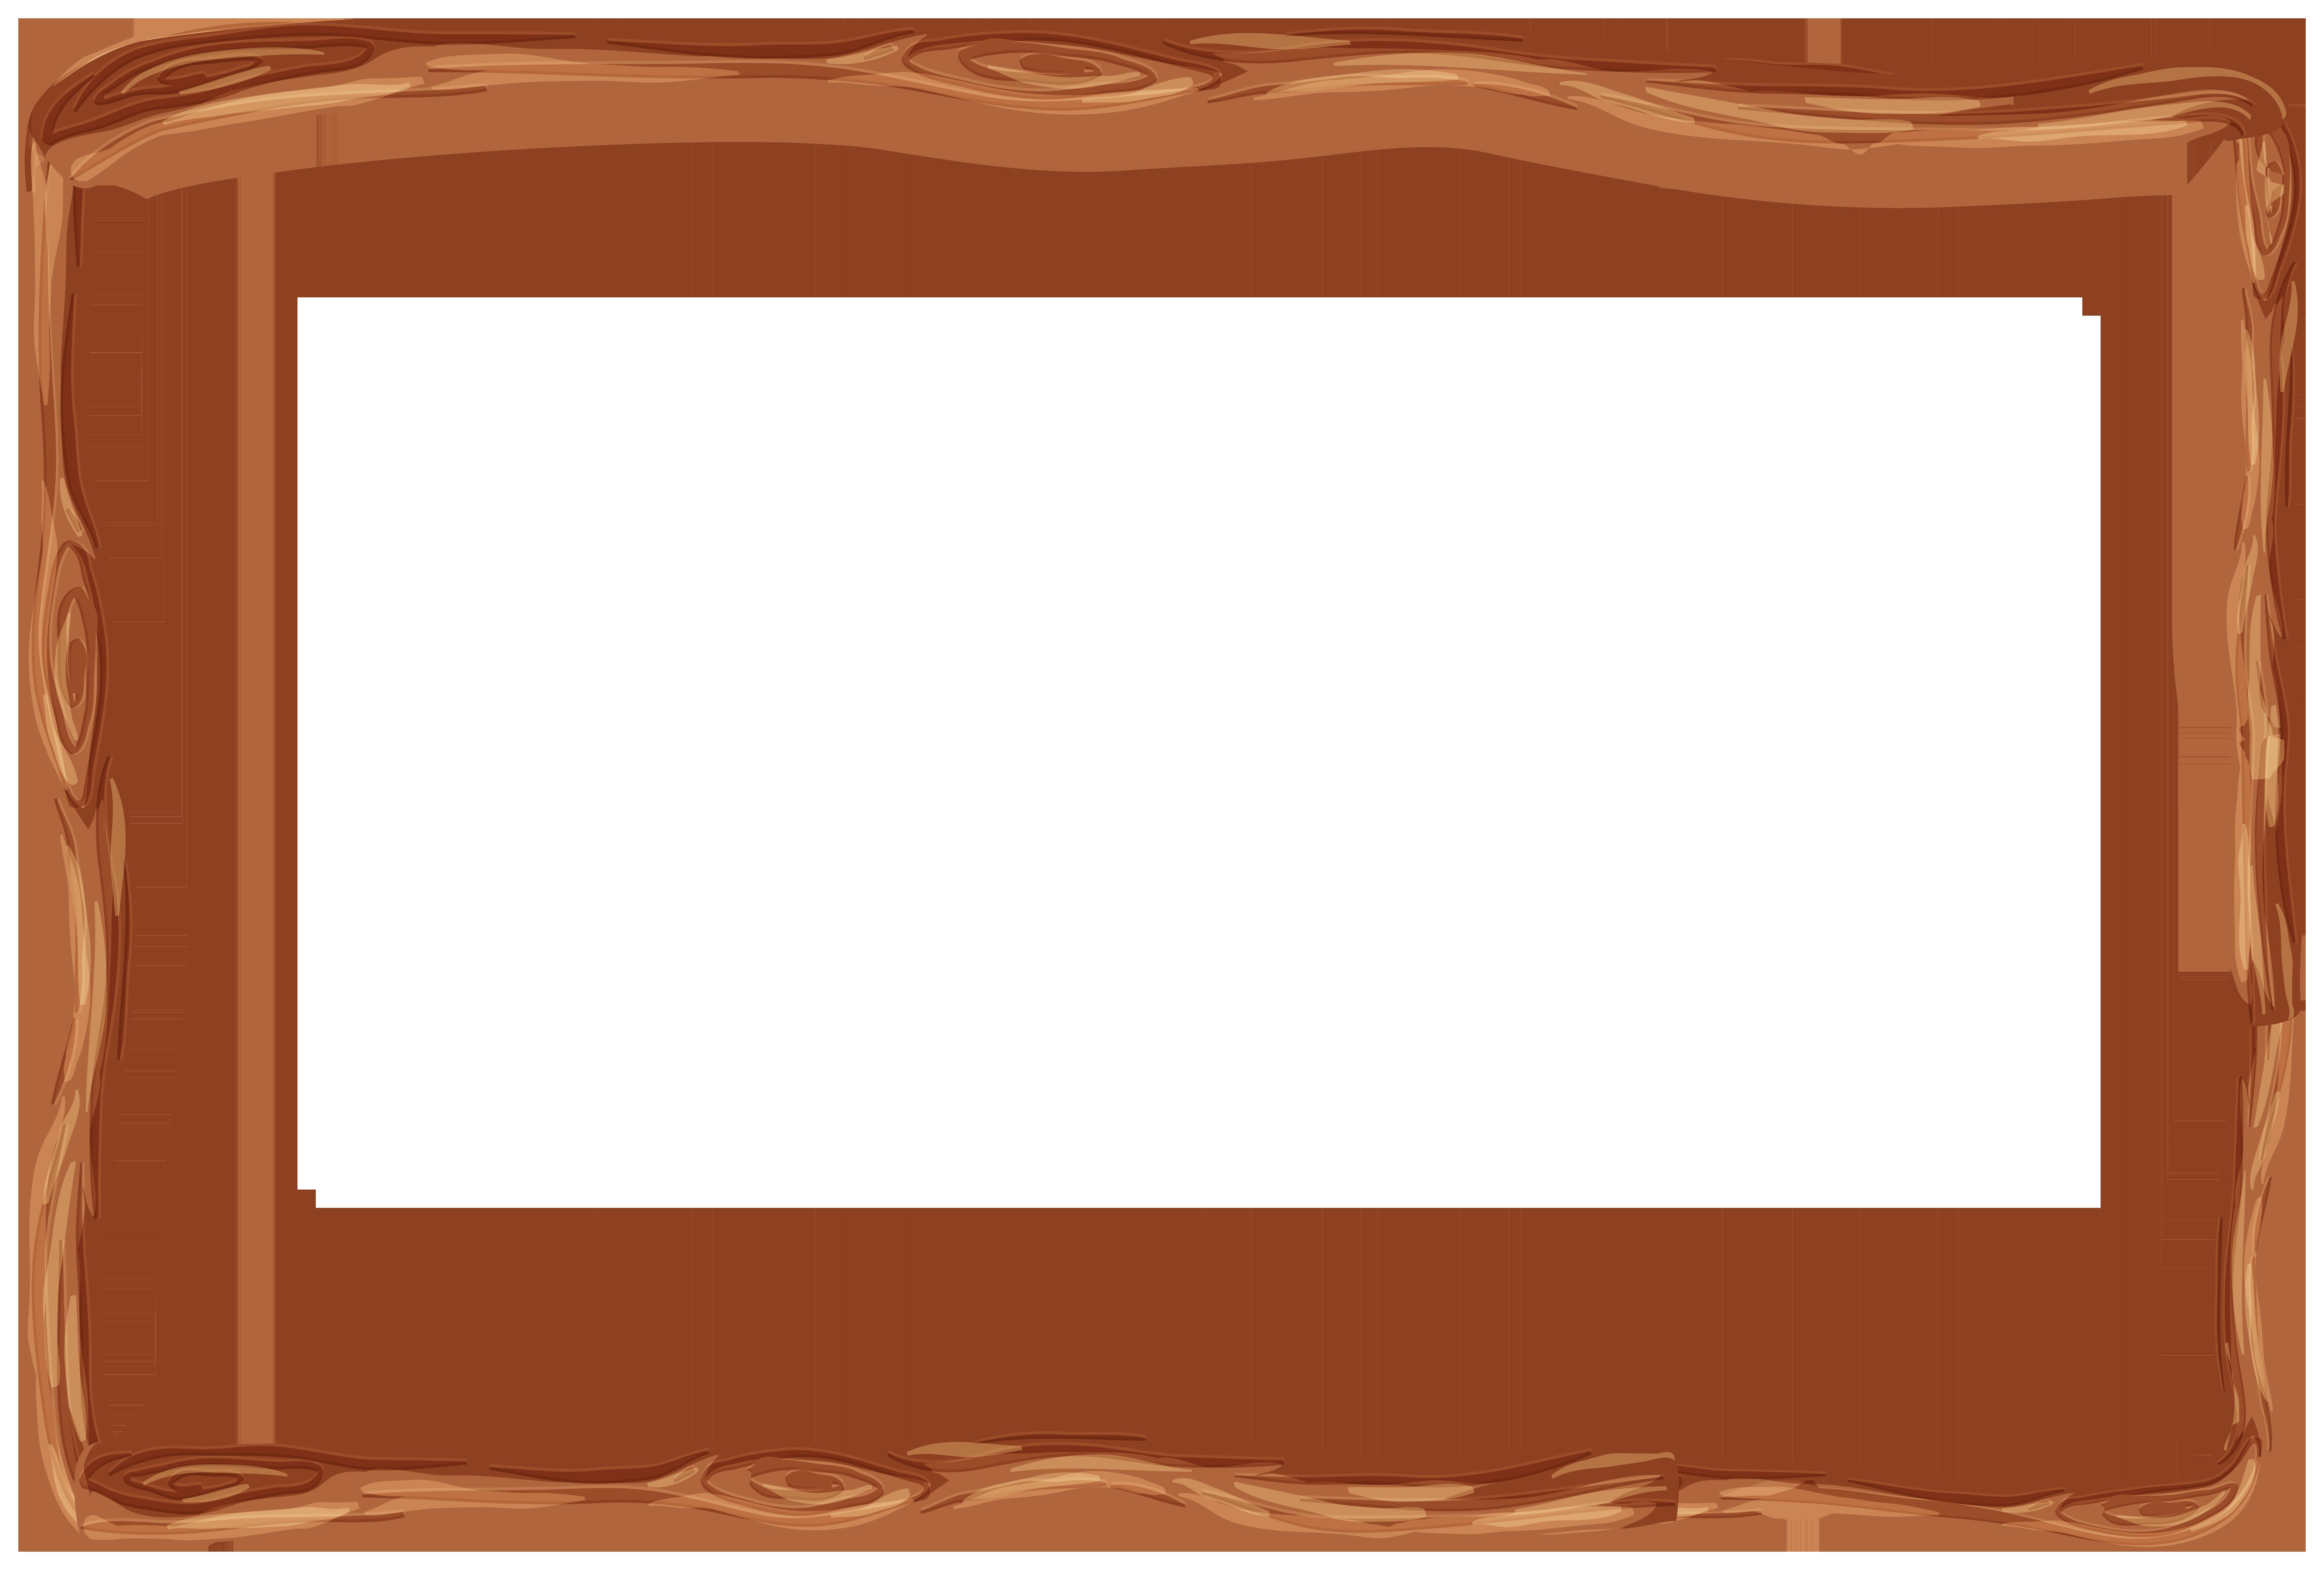 Wooden Frame Border PNG Clipart.